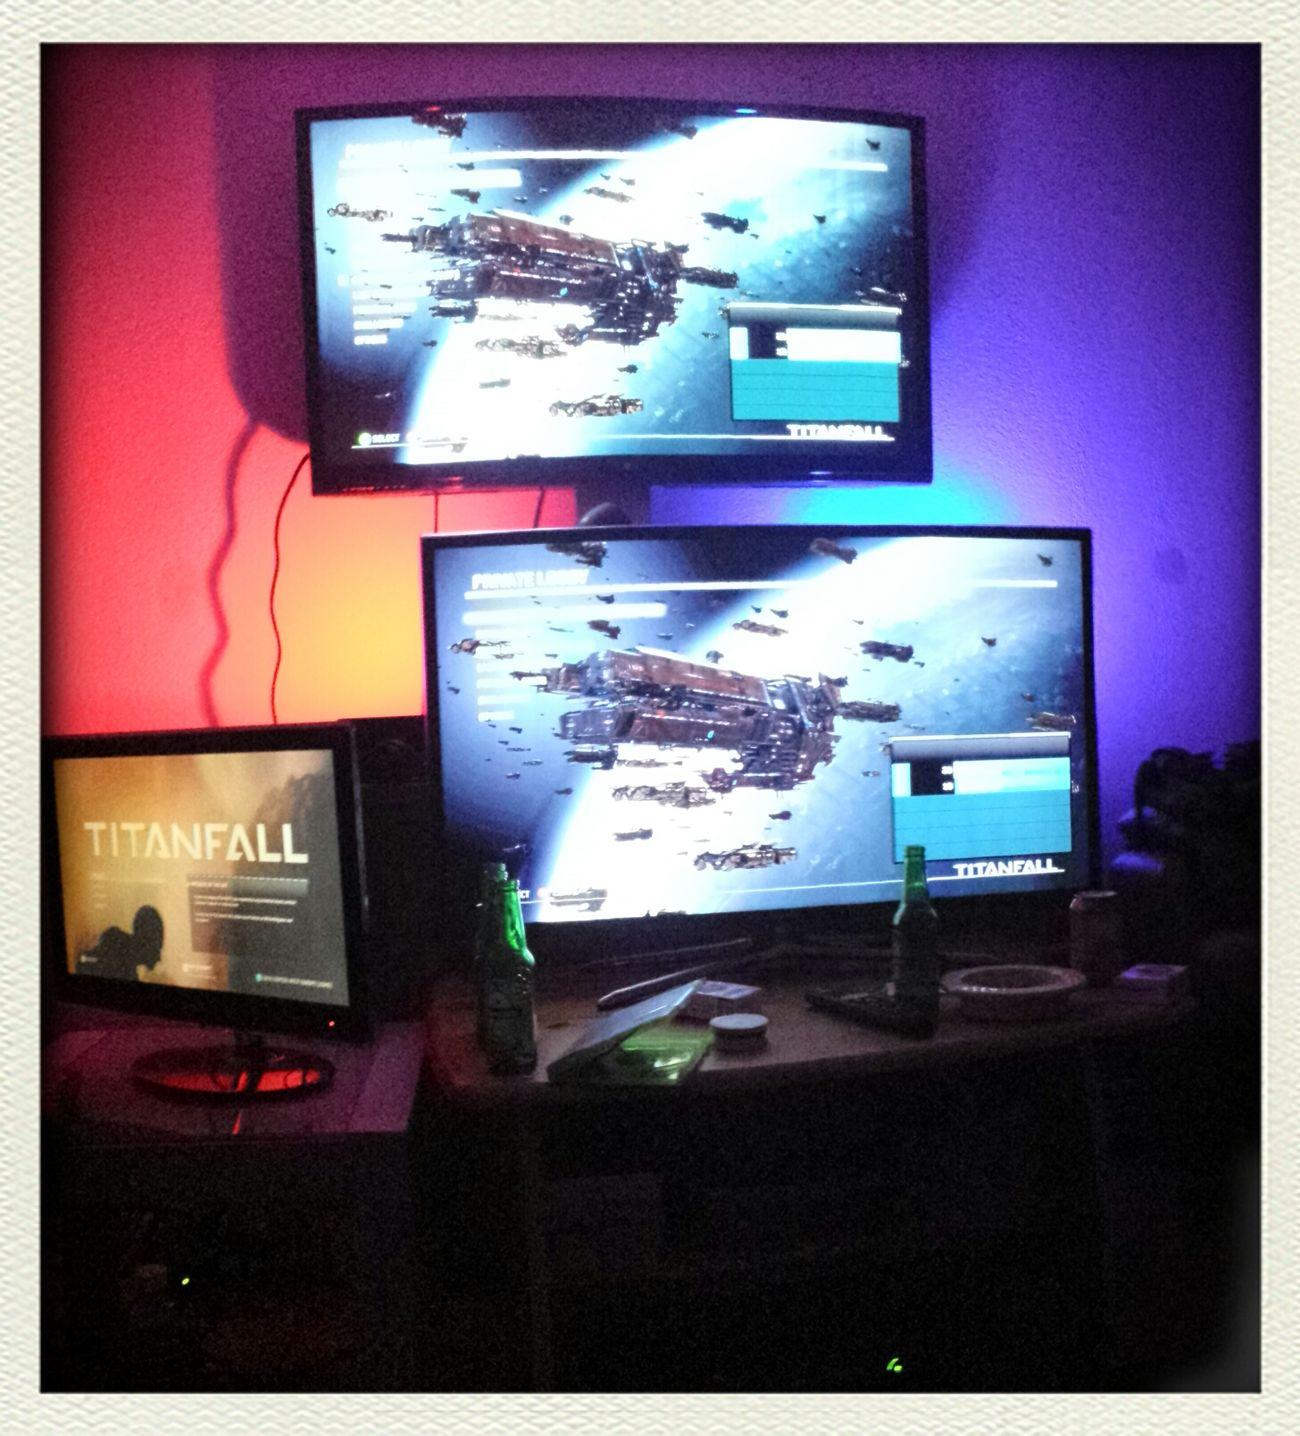 Titanfall is on! Titanfall Xbox 360 Nerd :)